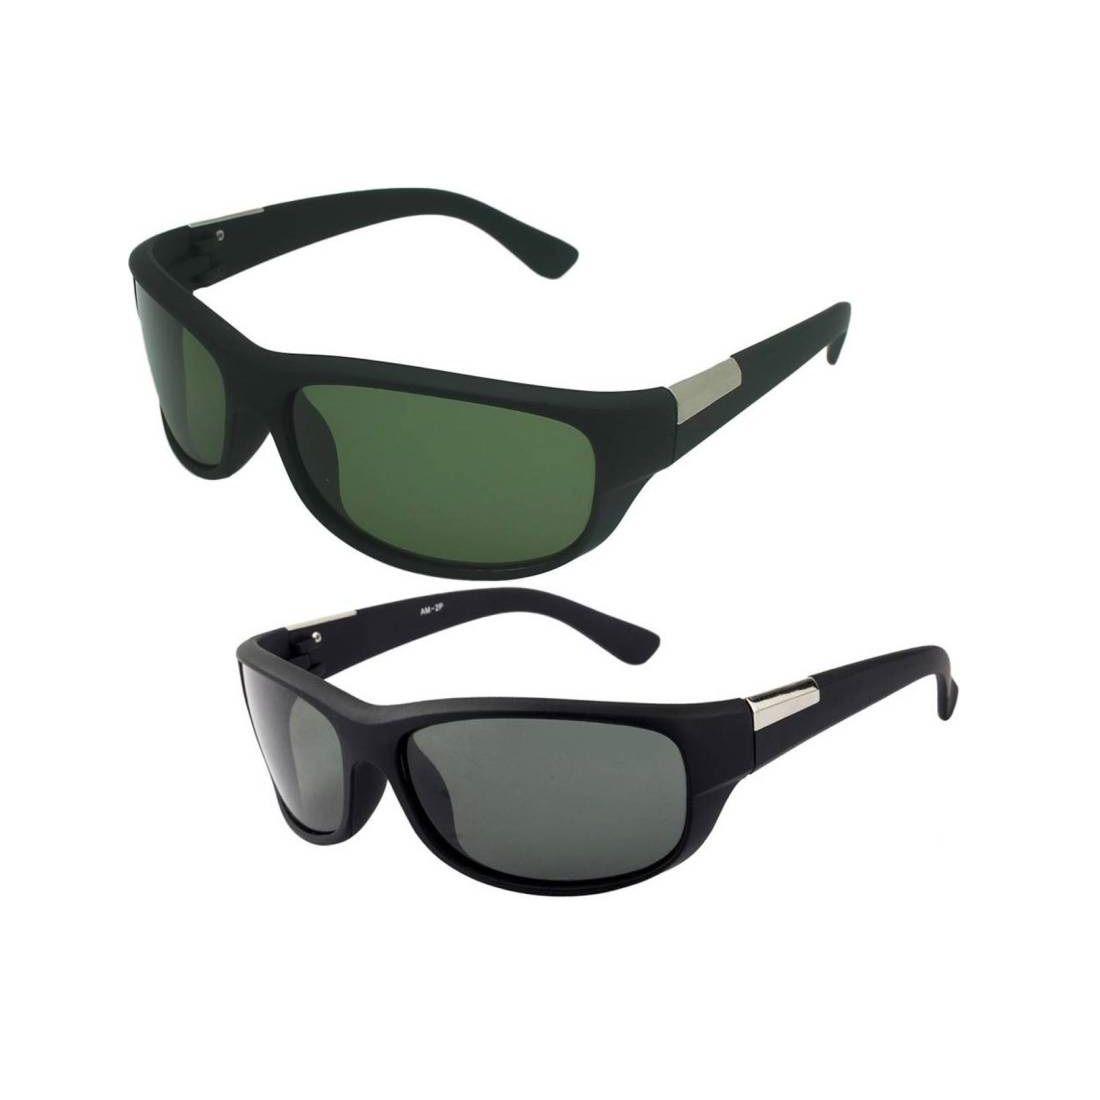 Joe Louis Green Wrap Around Sunglasses ( PPS21 )